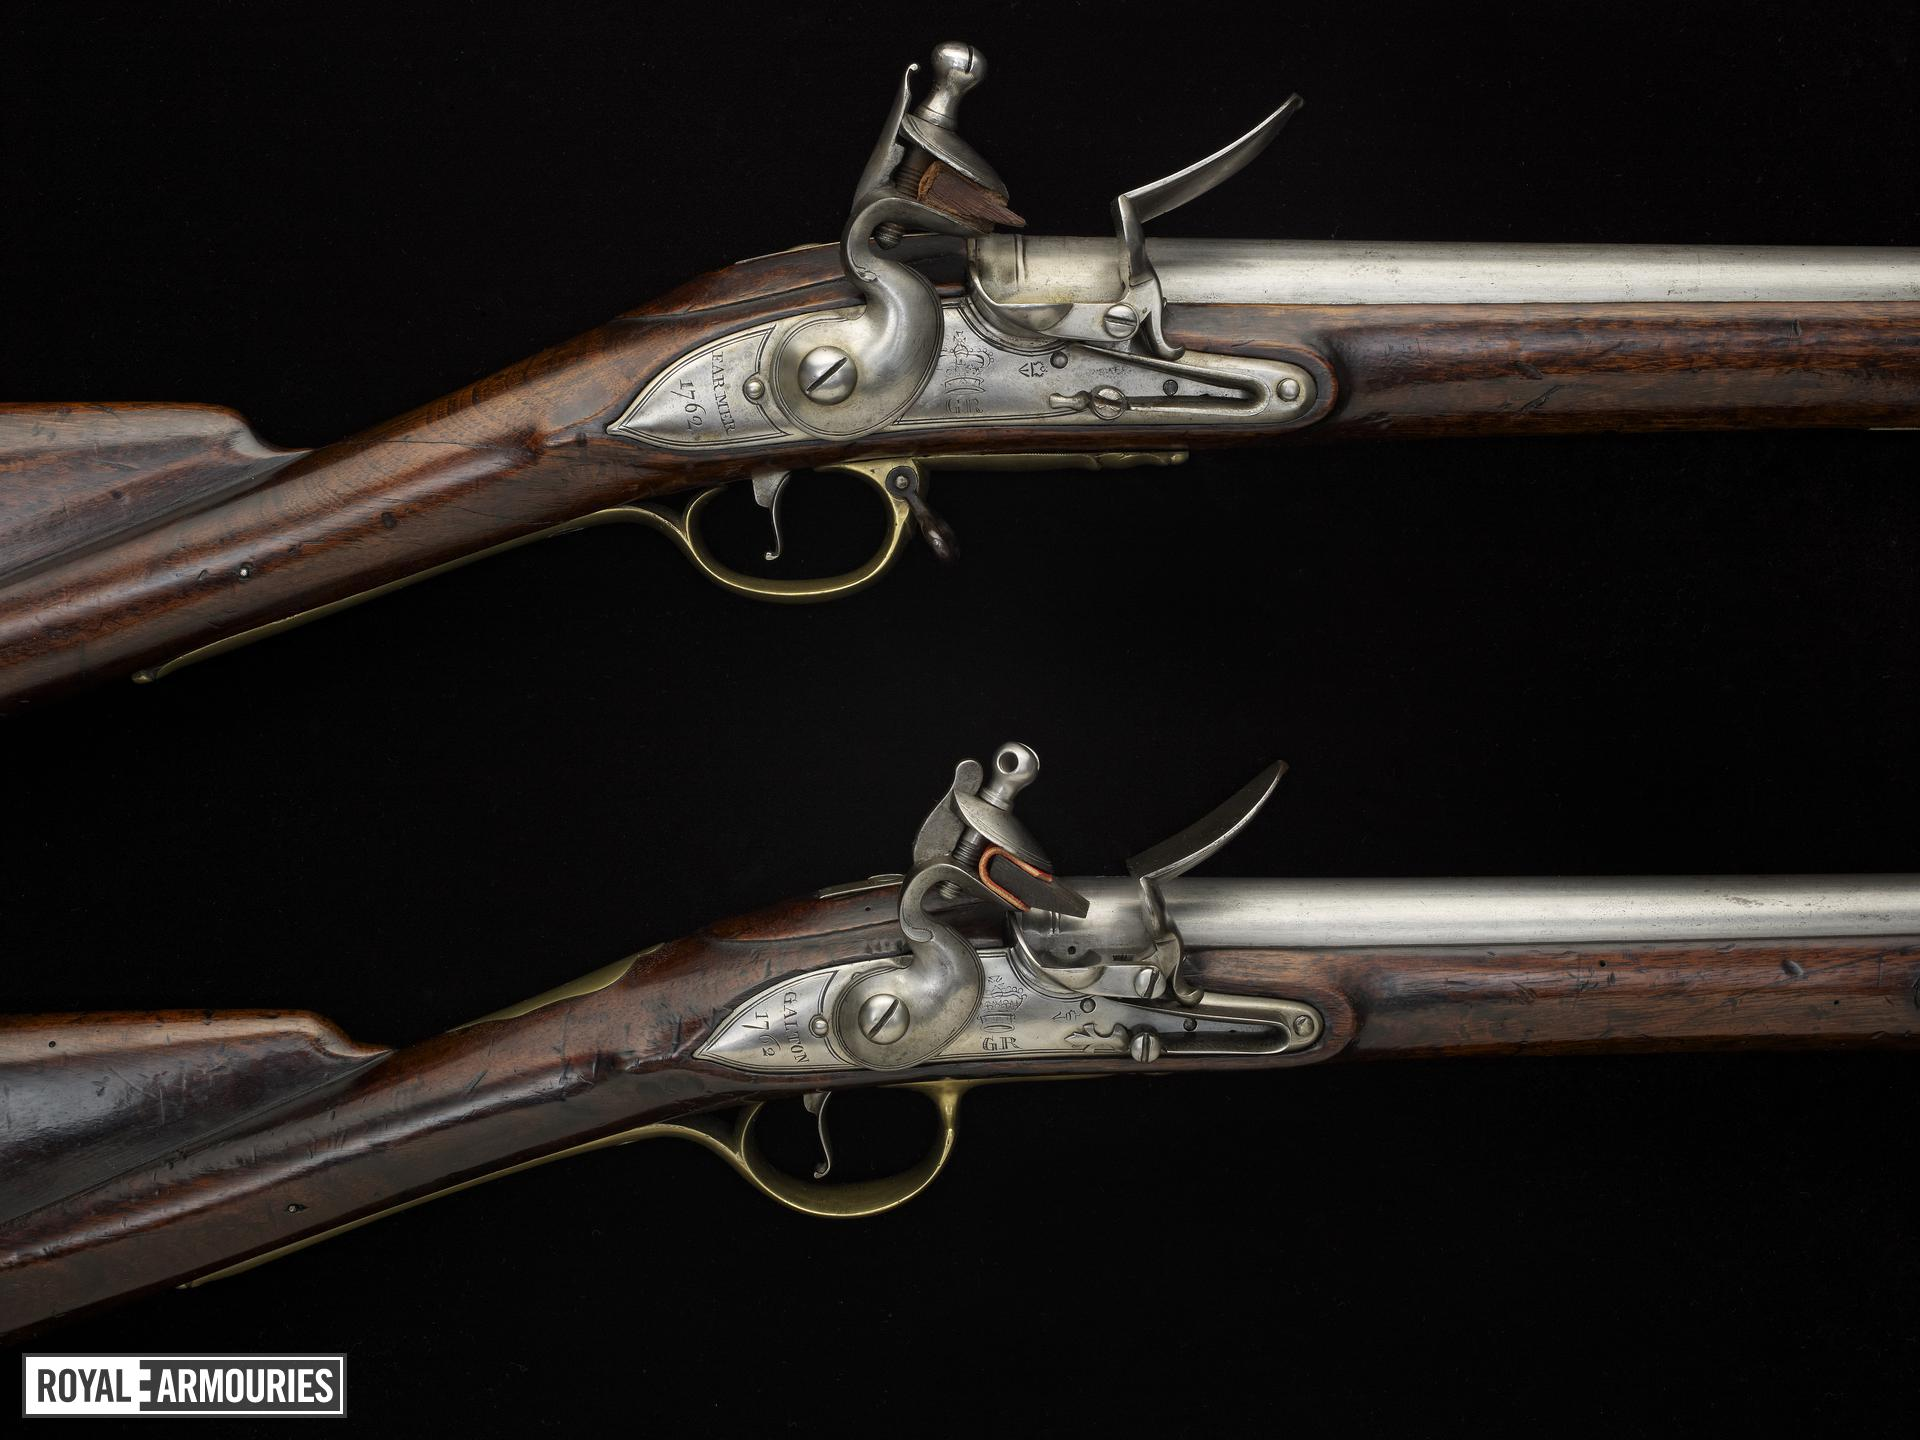 Flintlock muzzle-loading musket - Pattern 1759 Militia New Musket, pattern sample